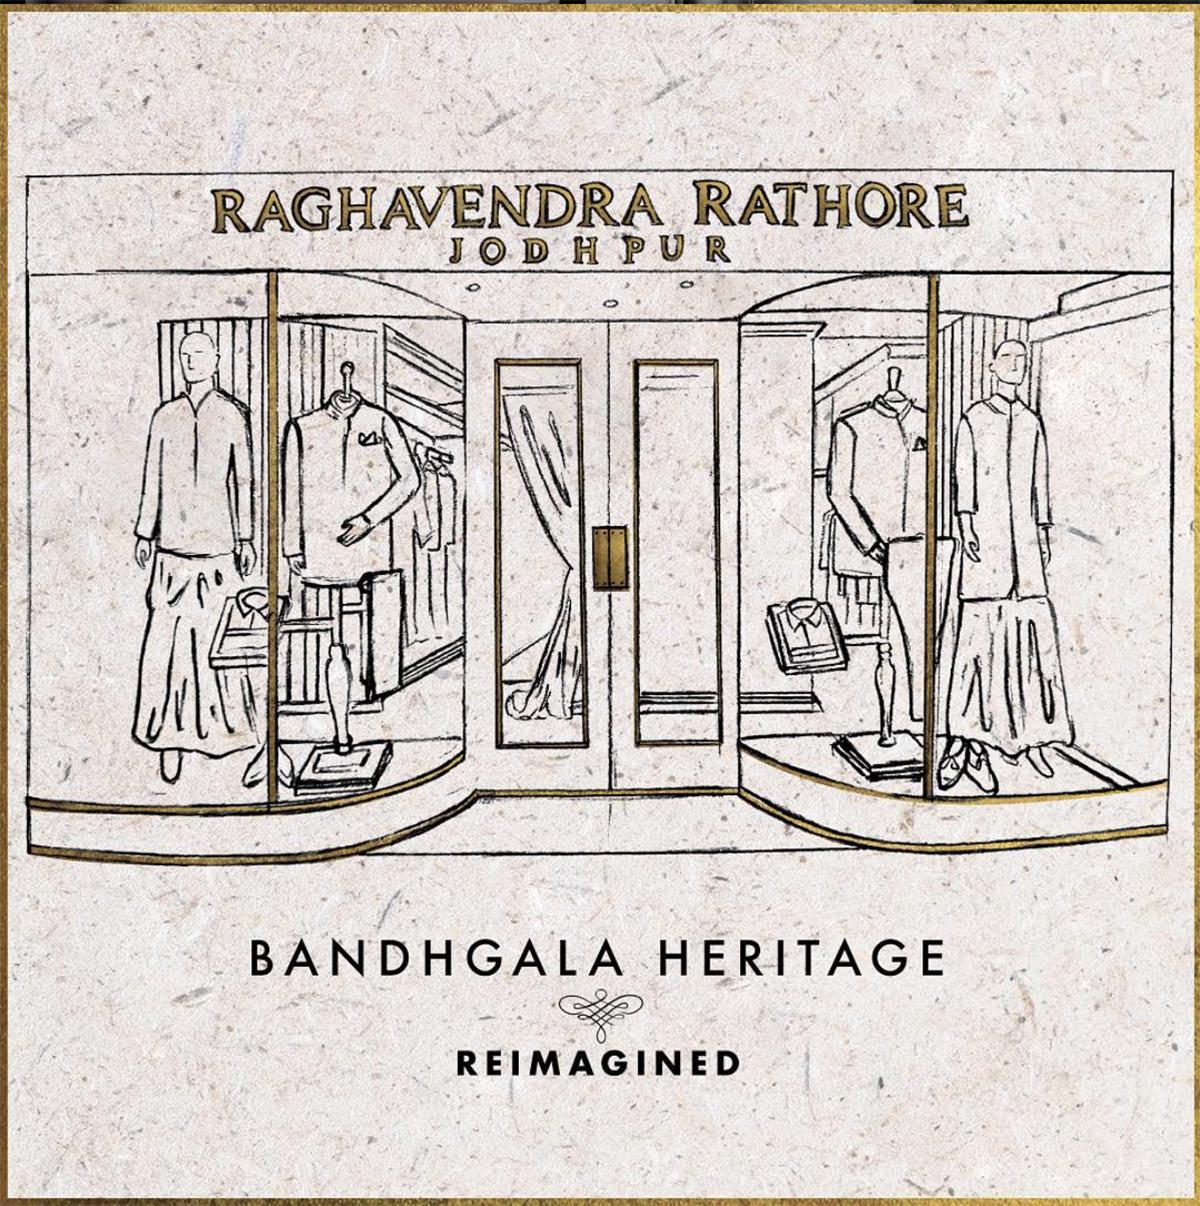 Raghavendra Rathore - Image credit: @raghavendra.rathore